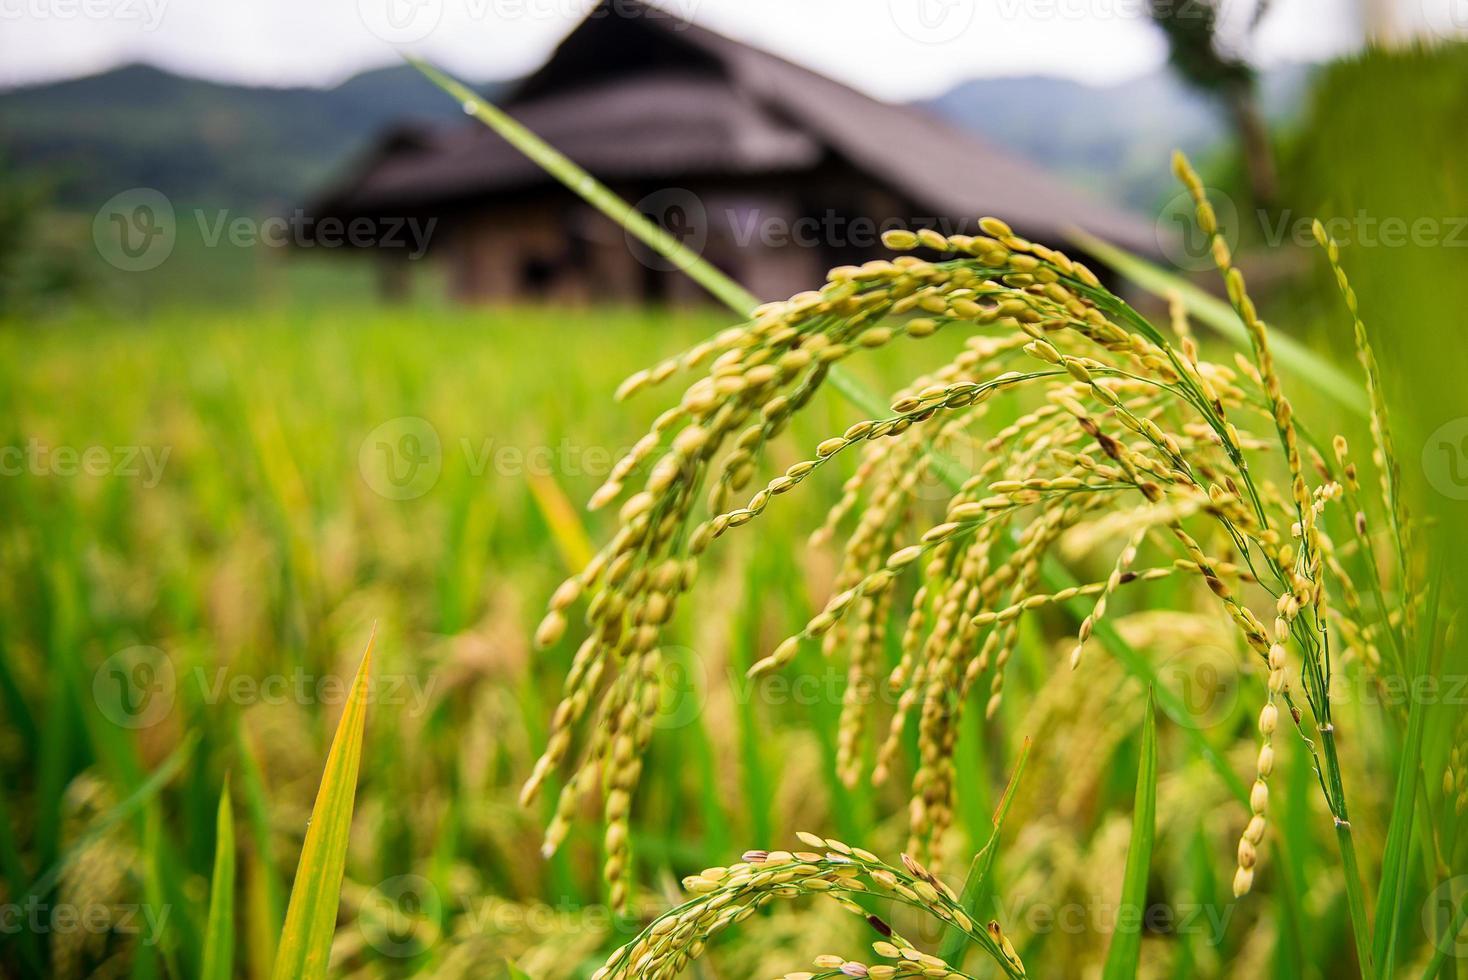 Paddies rice on terraced fields, Vietnam photo